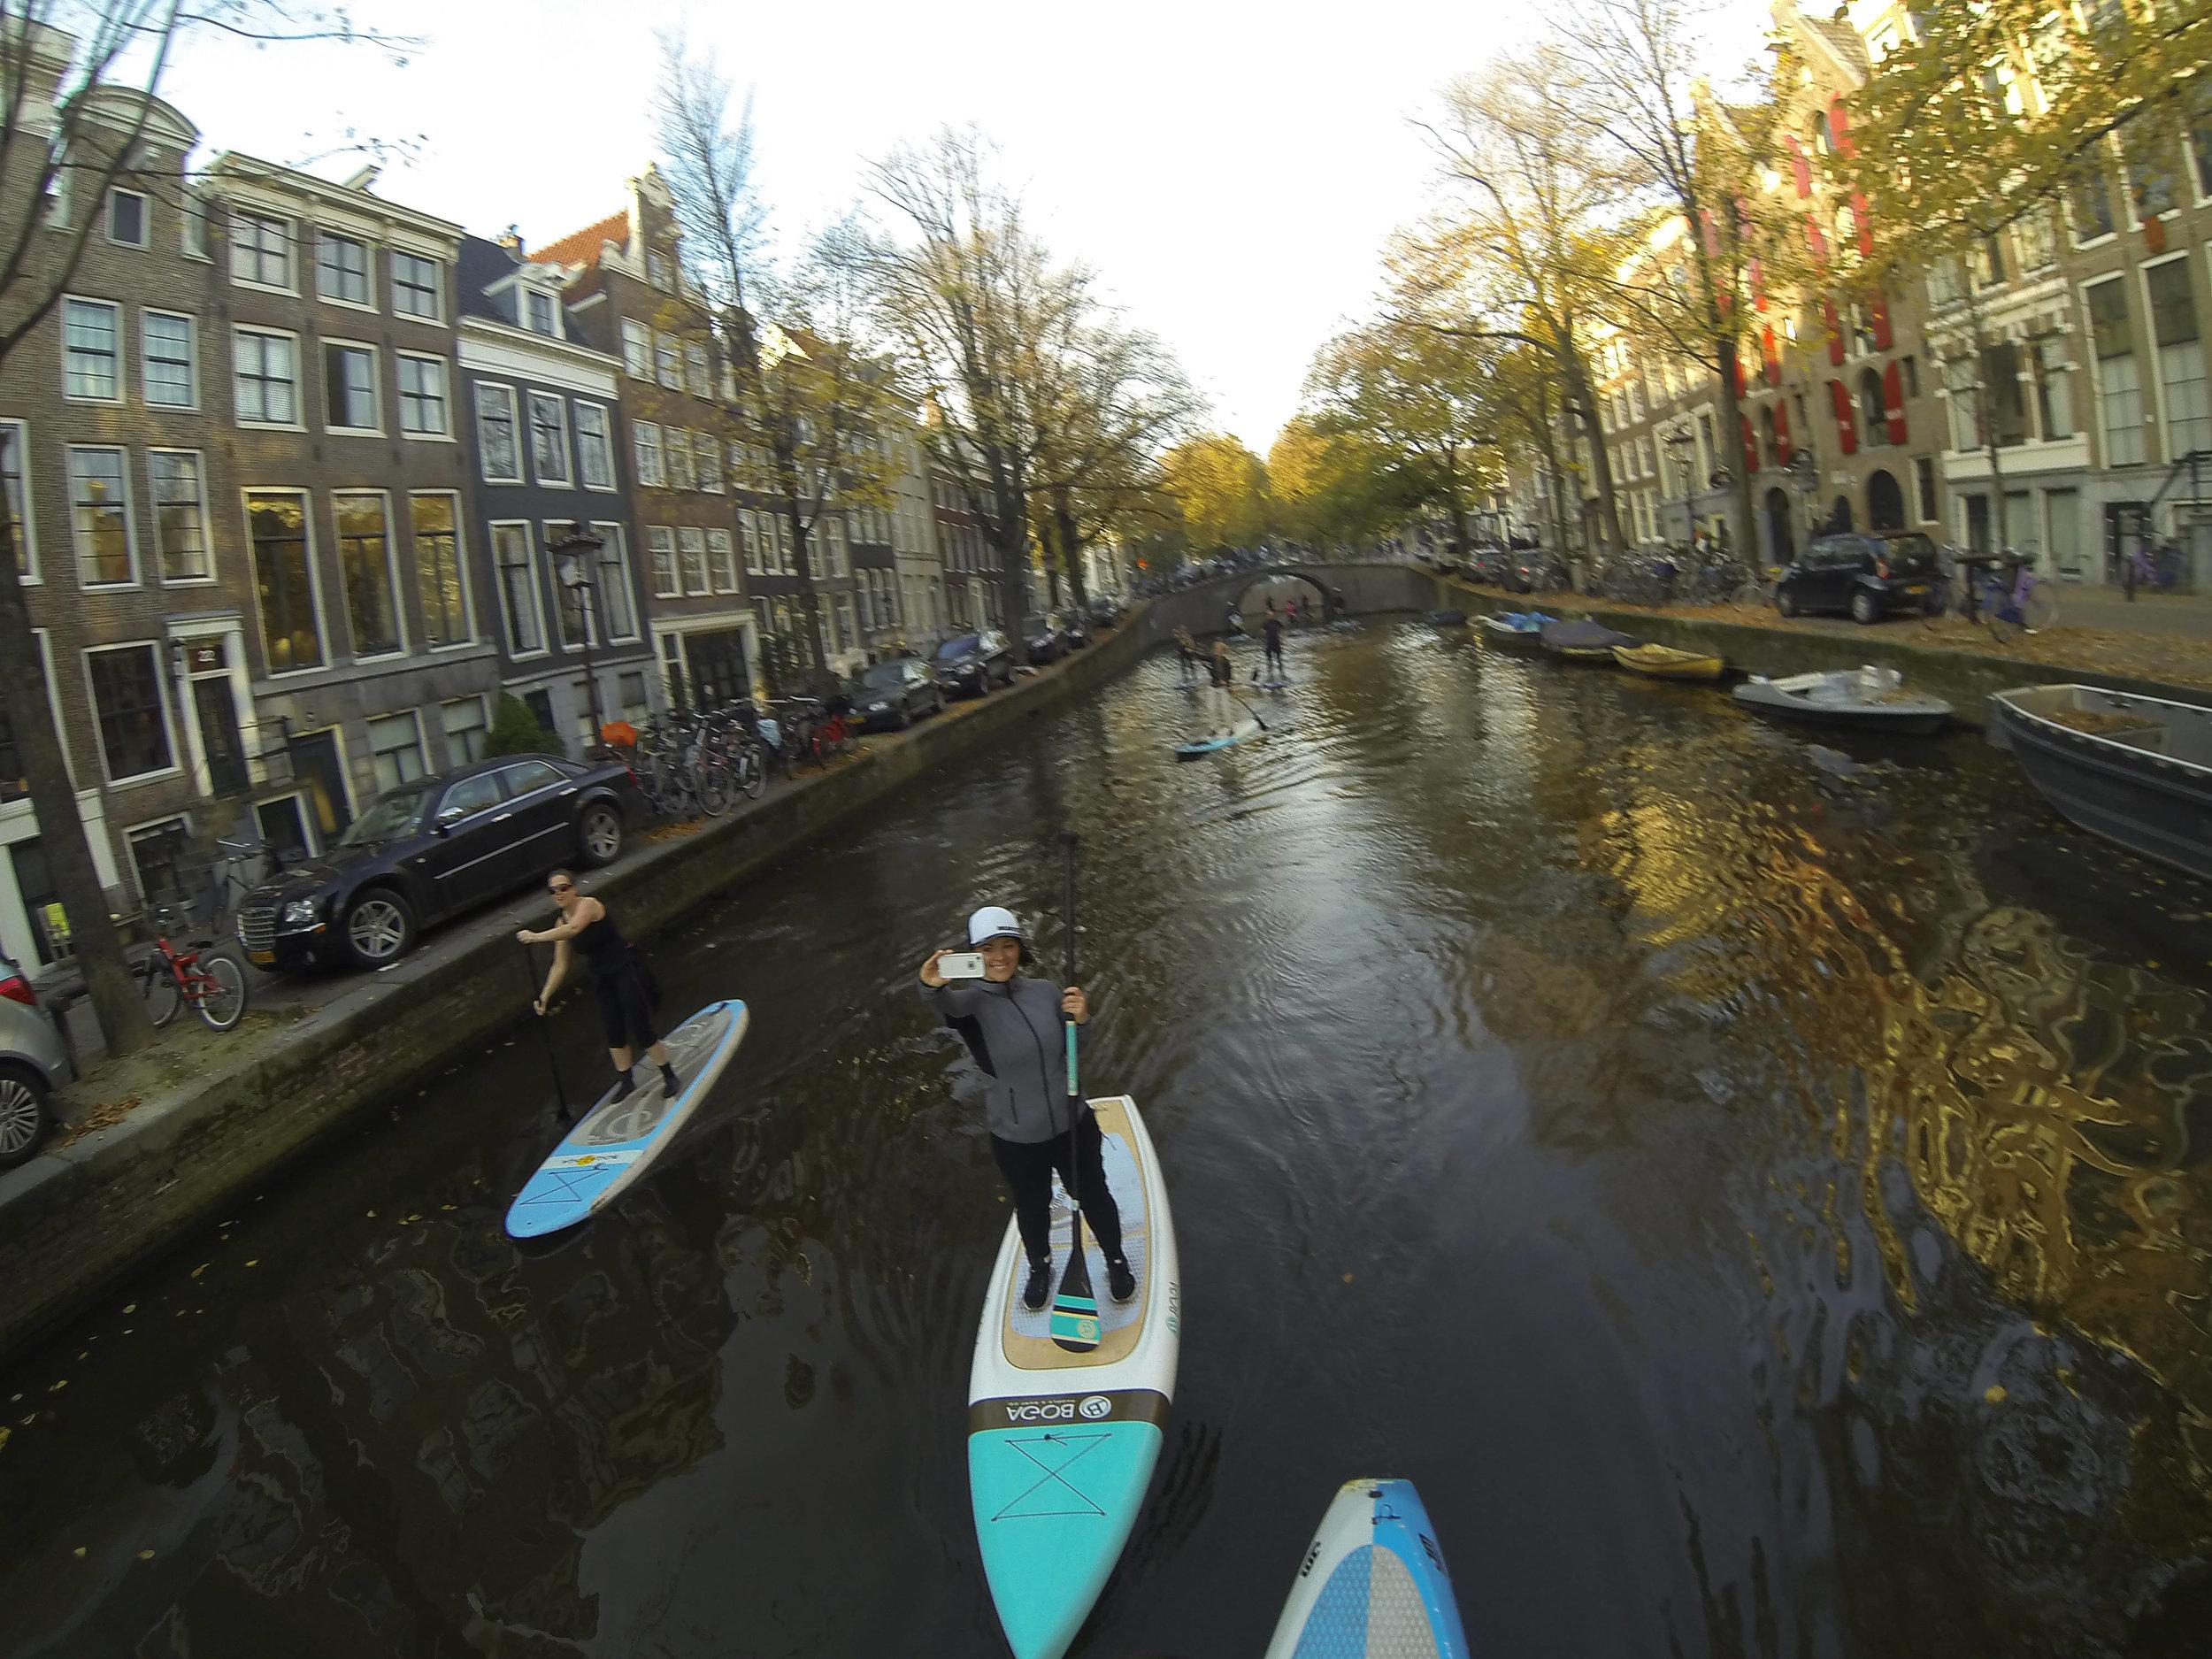 Amstel paddles